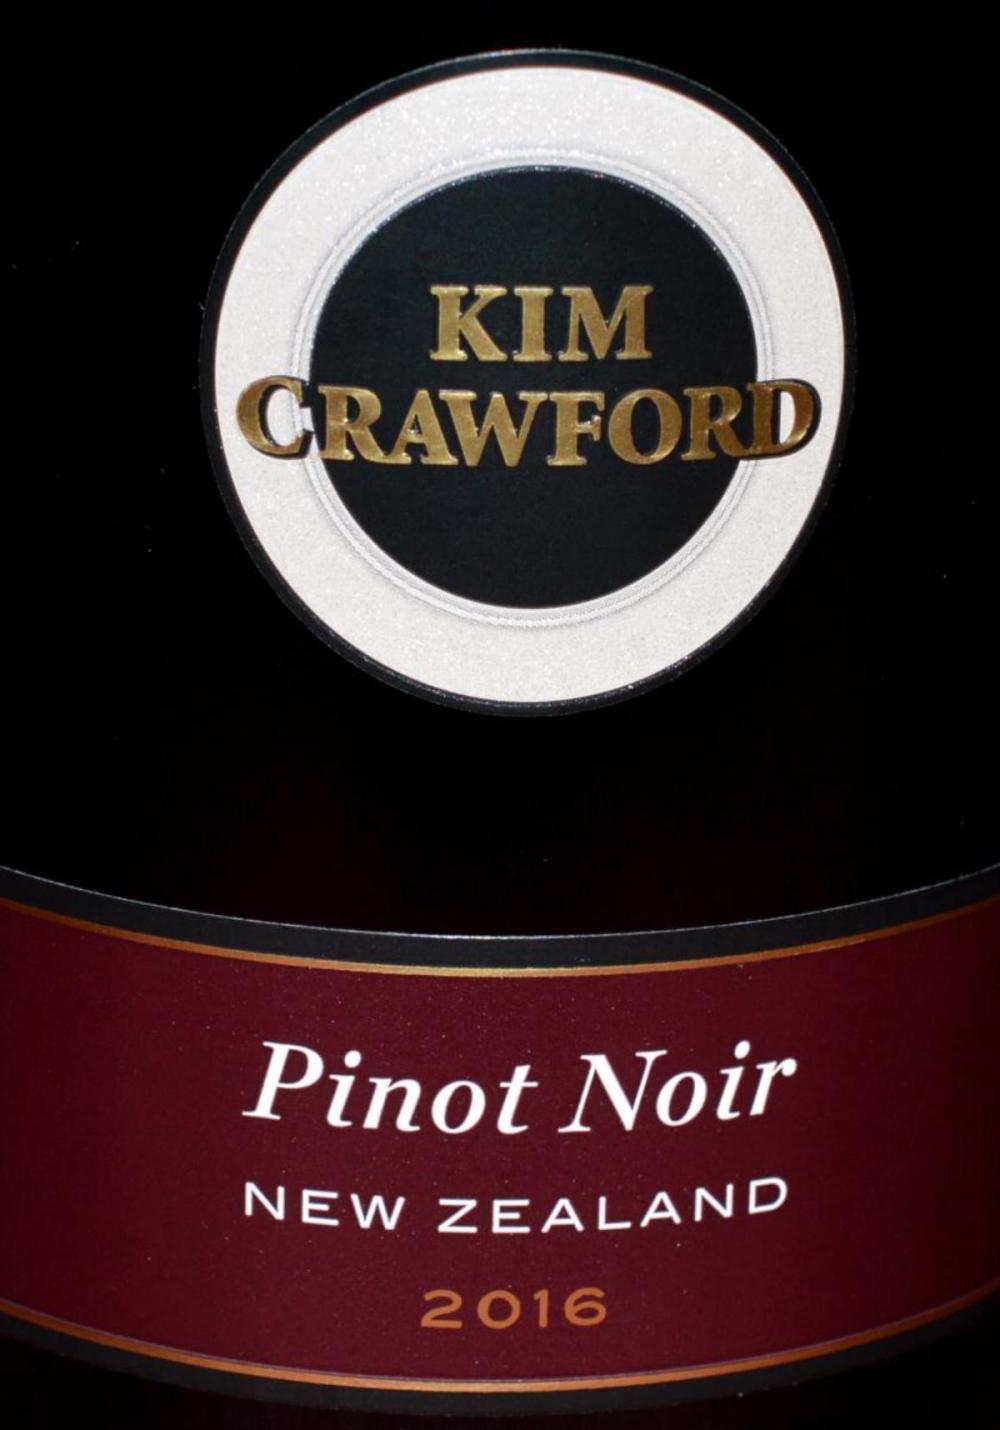 Lot 70C: Kim Crawford Pinot Noir Wine '16 New Zealand 750ml